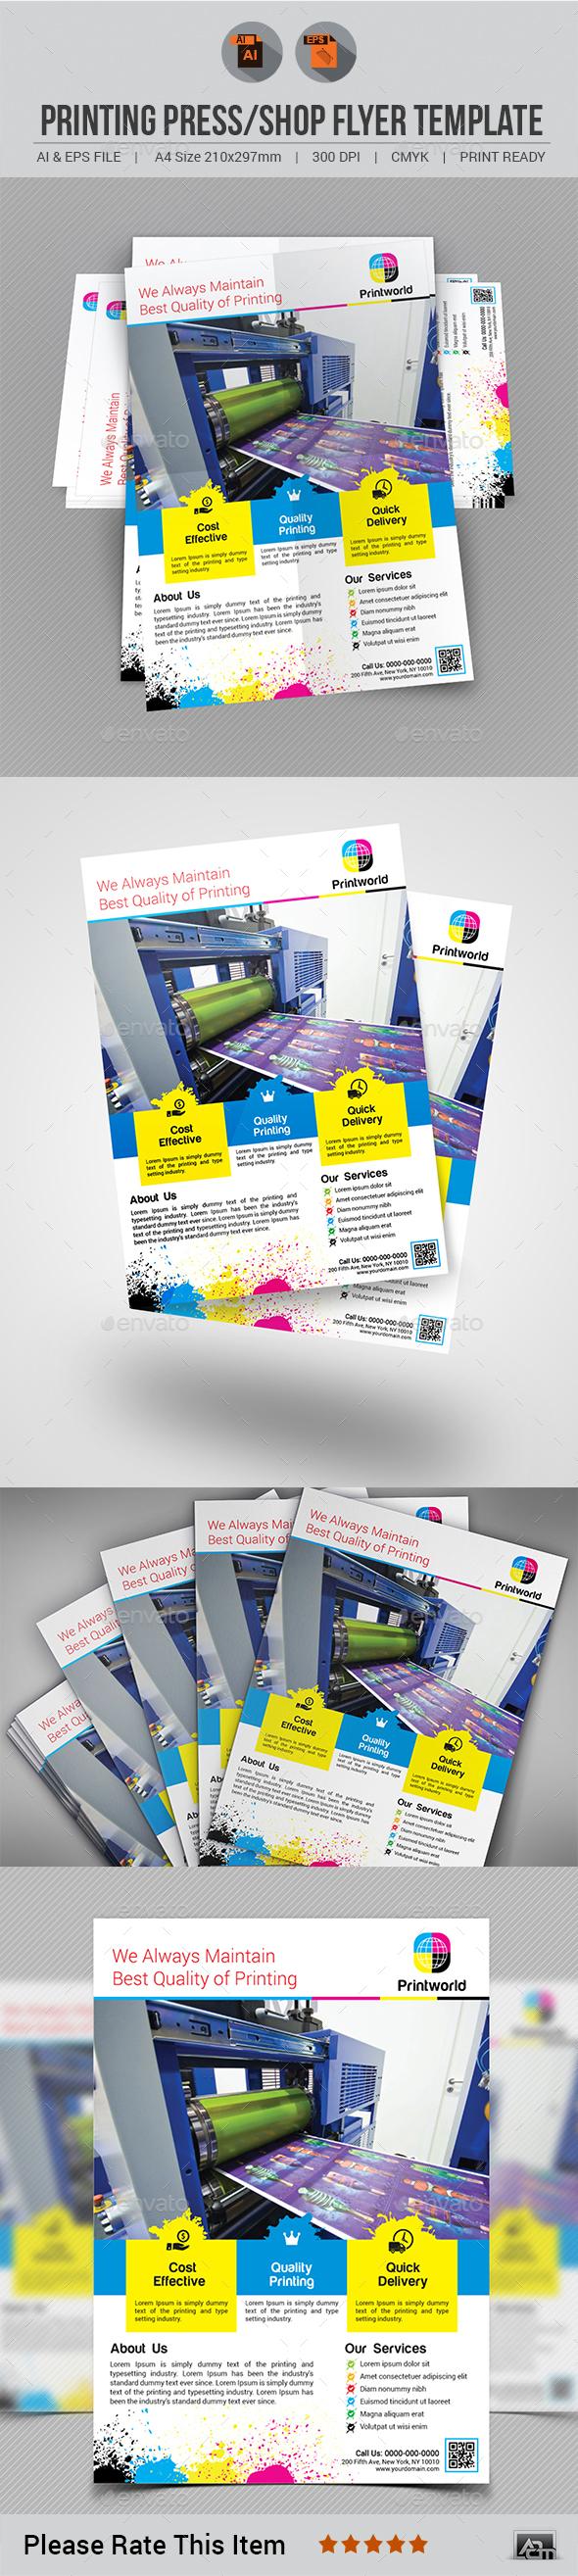 Printing Shop / Press Flyer - Commerce Flyers